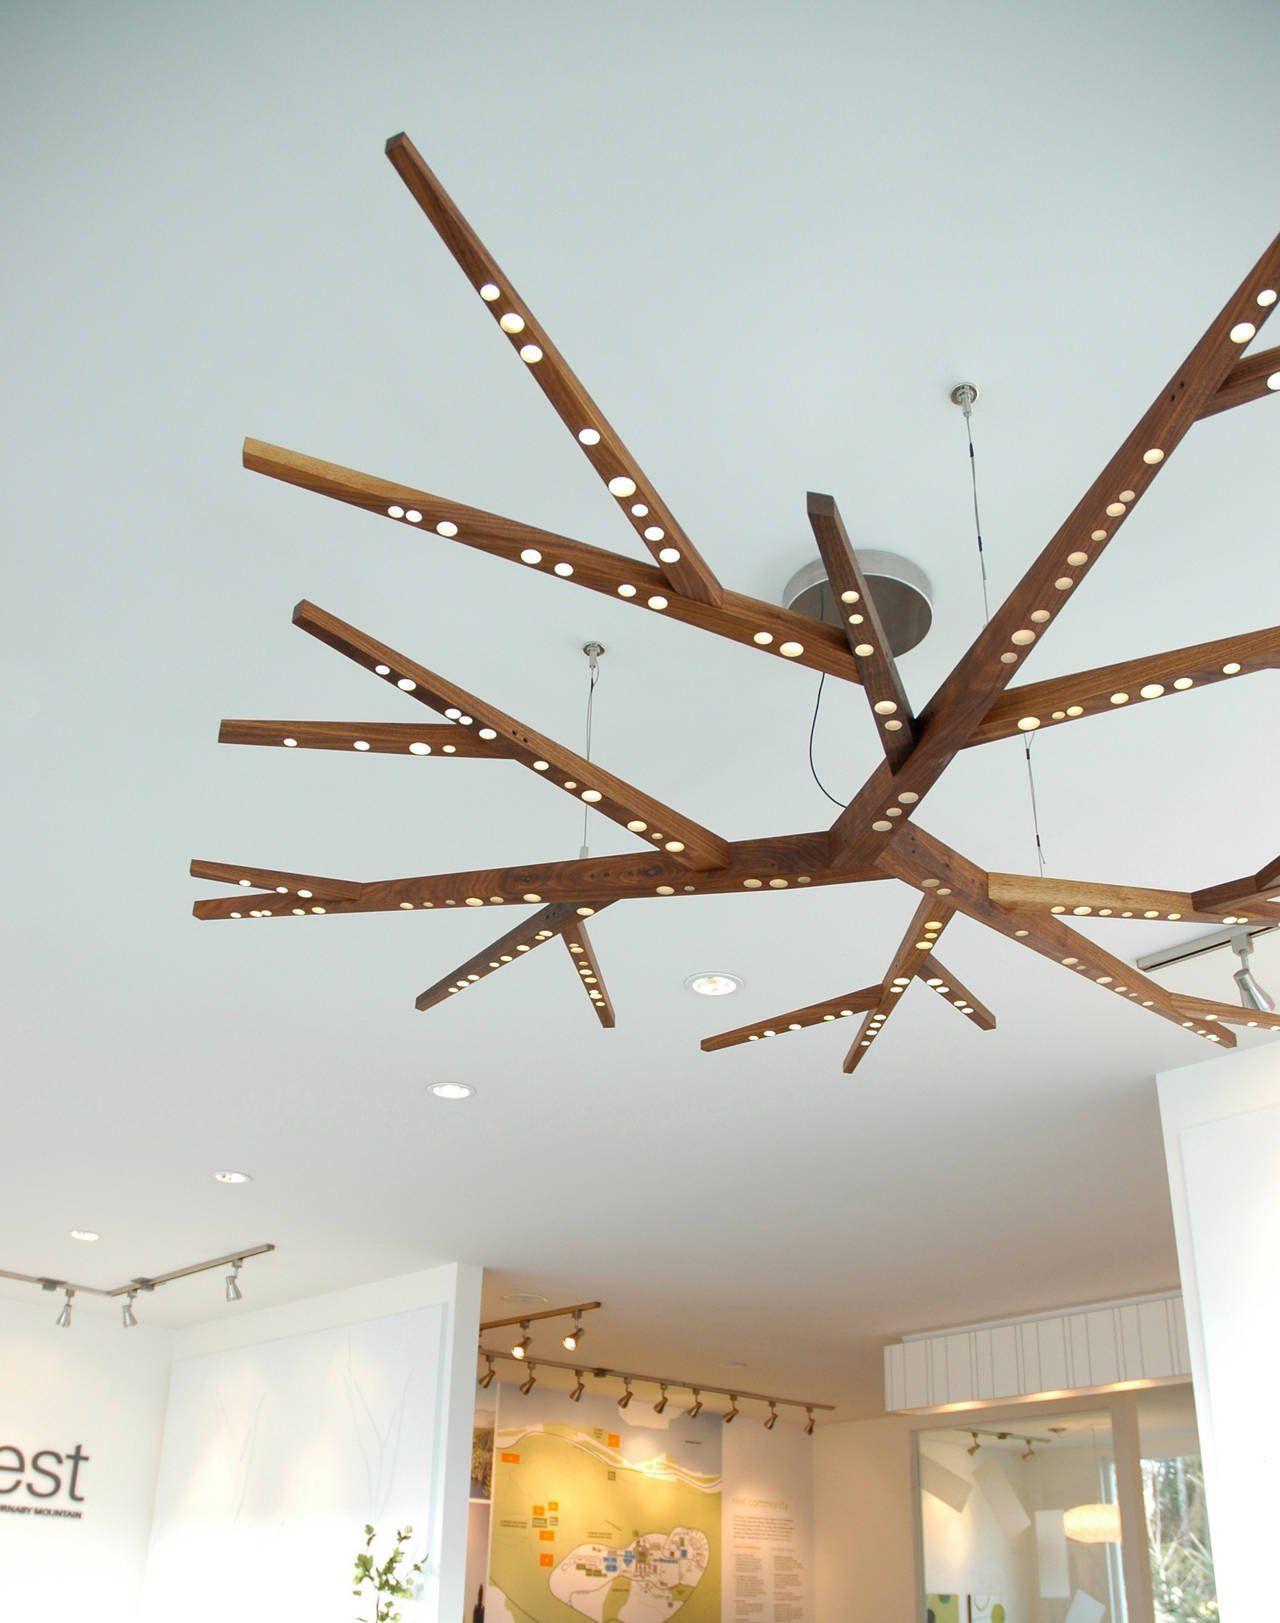 Myco 72 Ceiling Light Sculpture | Ceiling lights for Ceiling Light Sculpture  lp0lpmzq